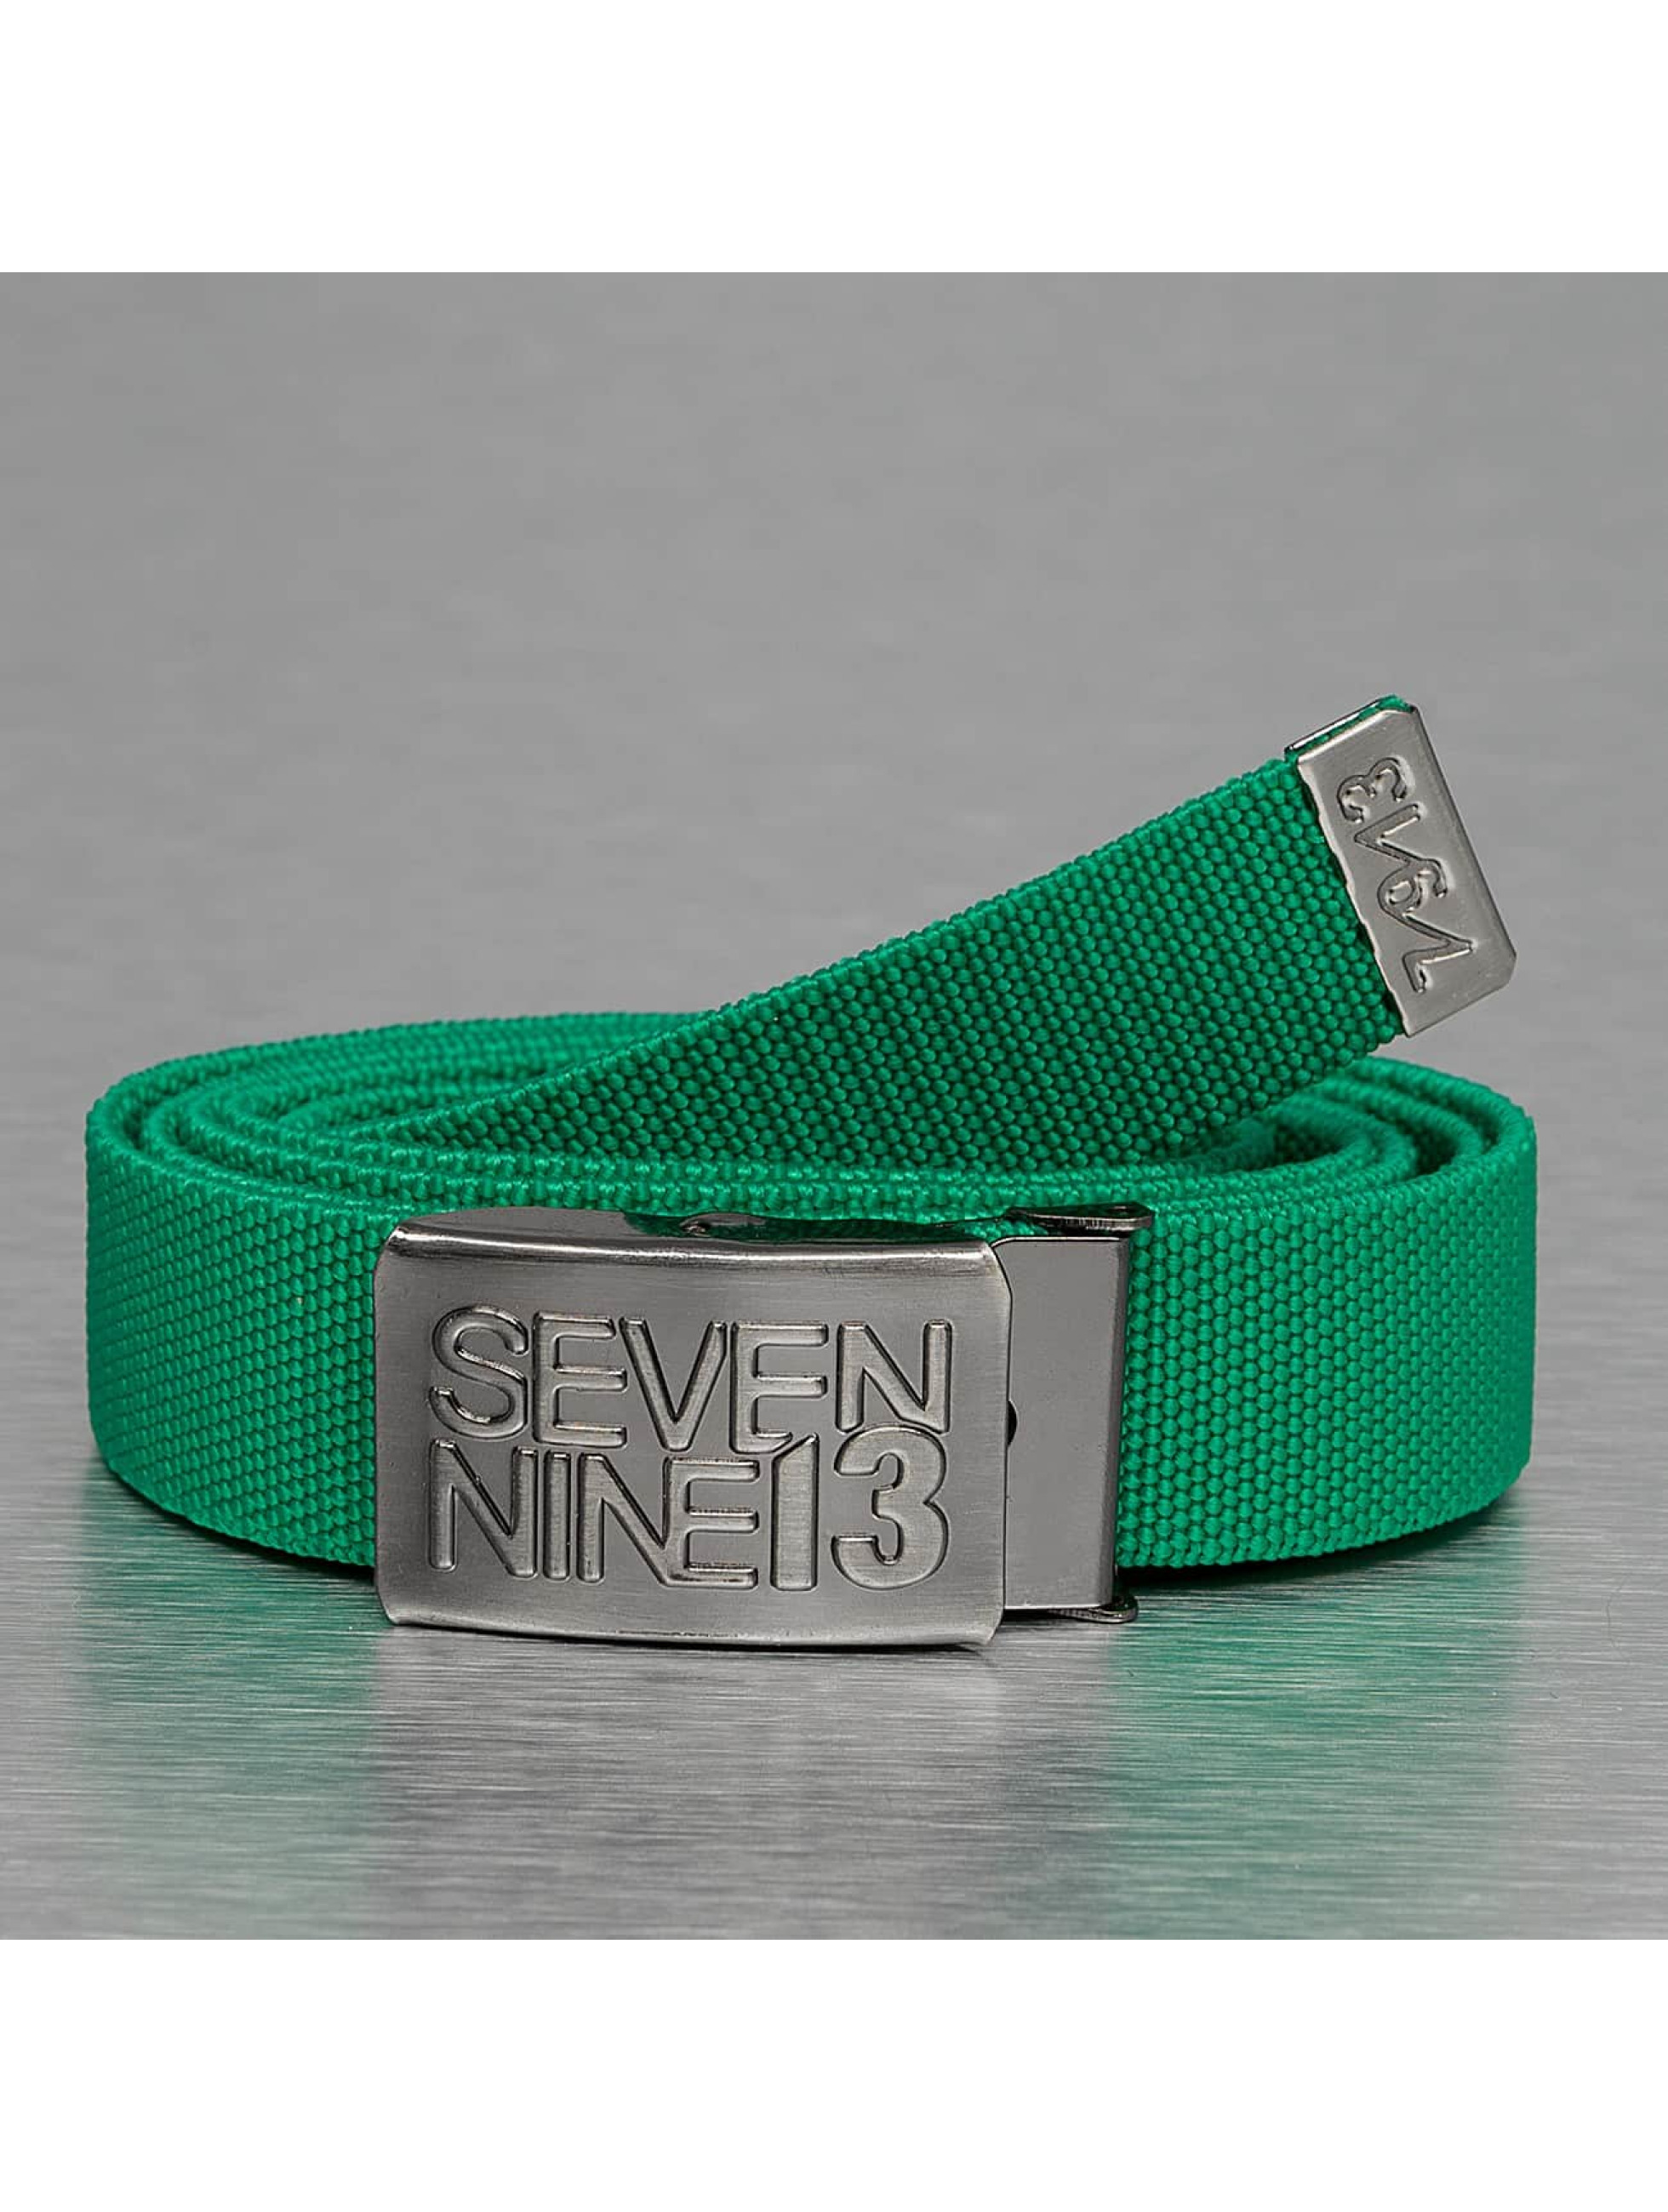 Seven Nine 13 Cintura Jaws Stretch verde